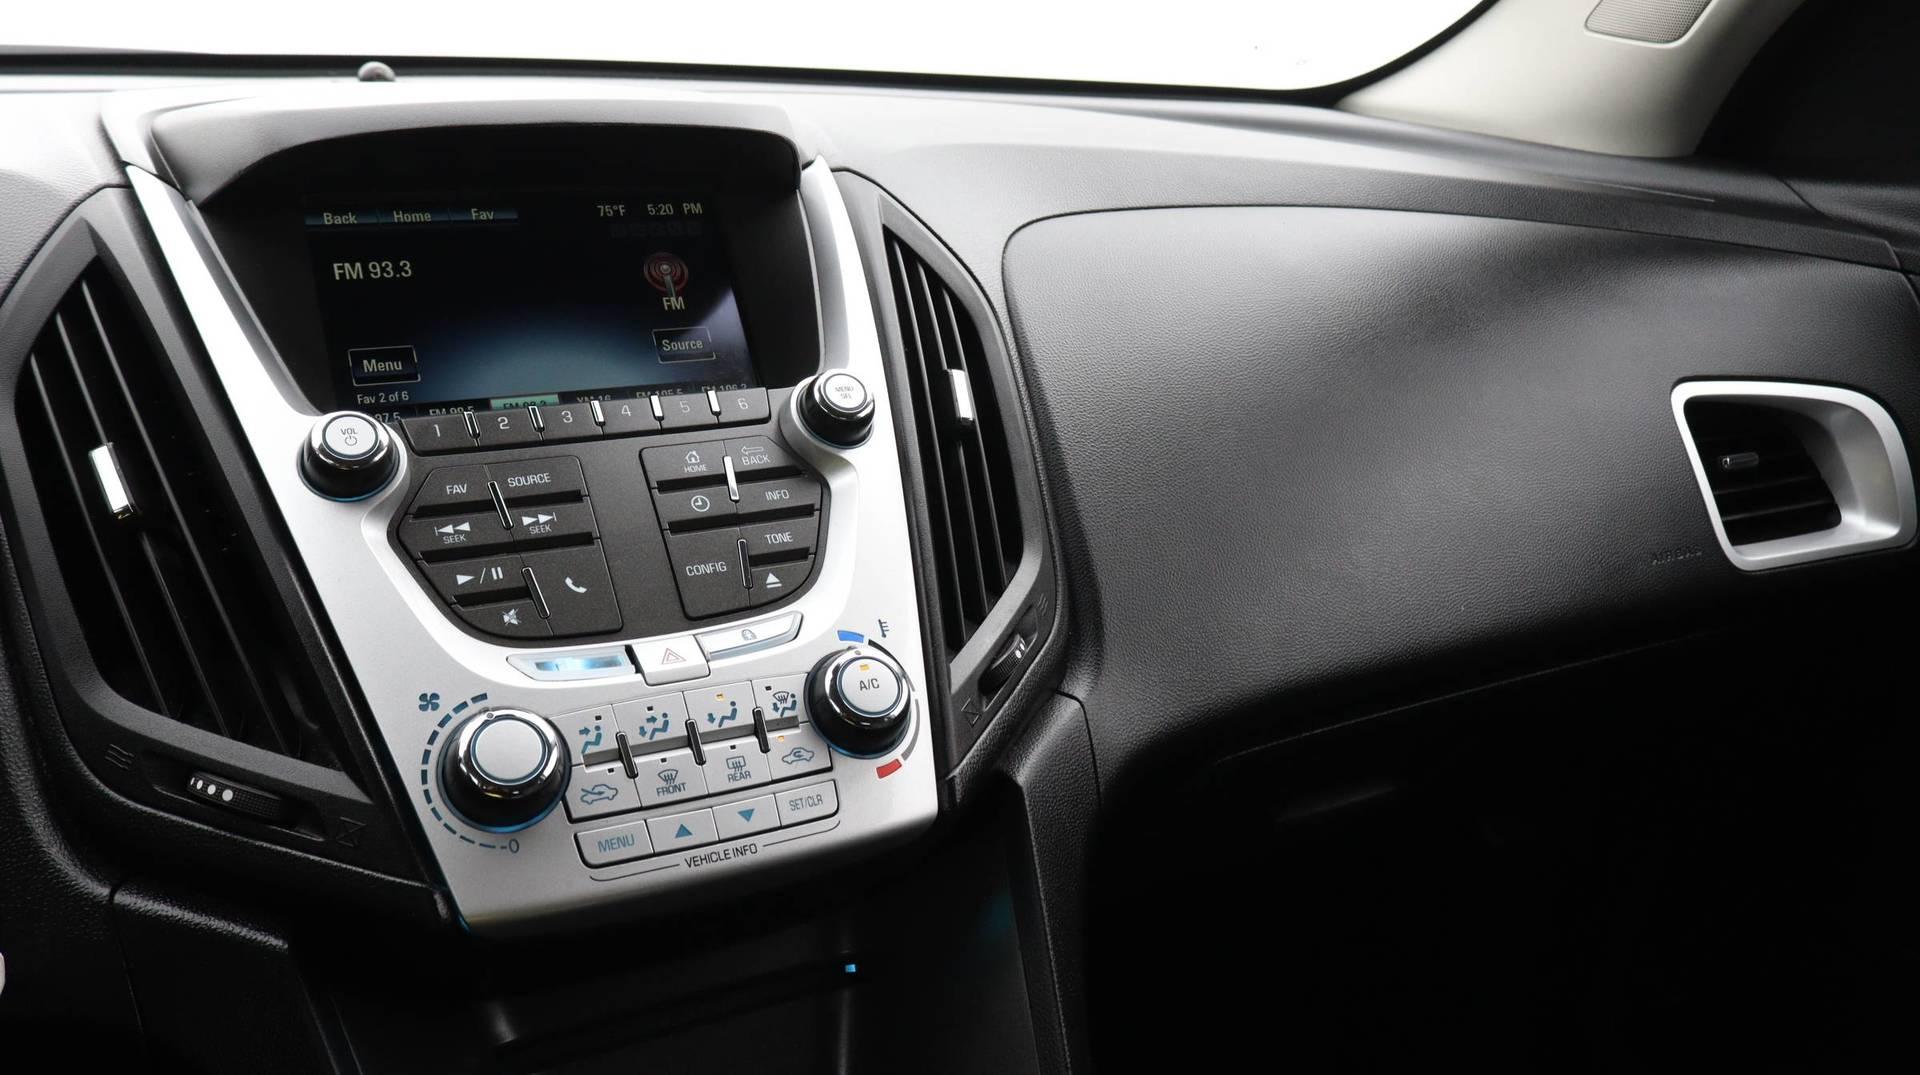 Florida Fine Cars - Used vehicle - SUV CHEVROLET EQUINOX 2015